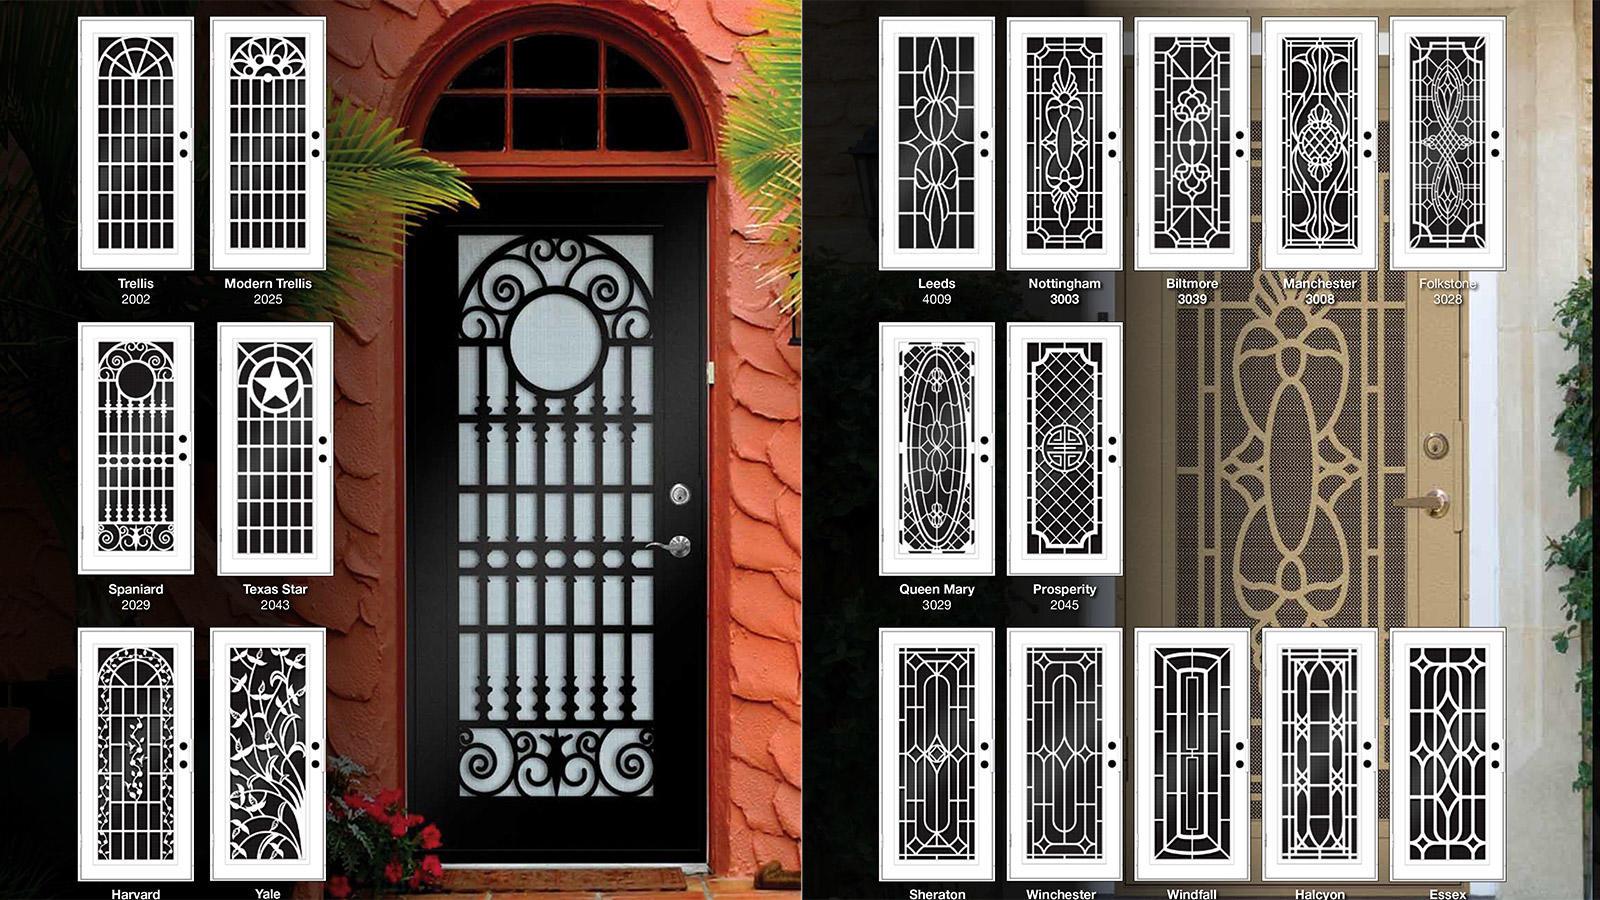 Energy Shield Window U0026 Door Company Is Proud To Be A Distributor Of Titan  Security Doors. These Doors Are Truly Works Of Art.